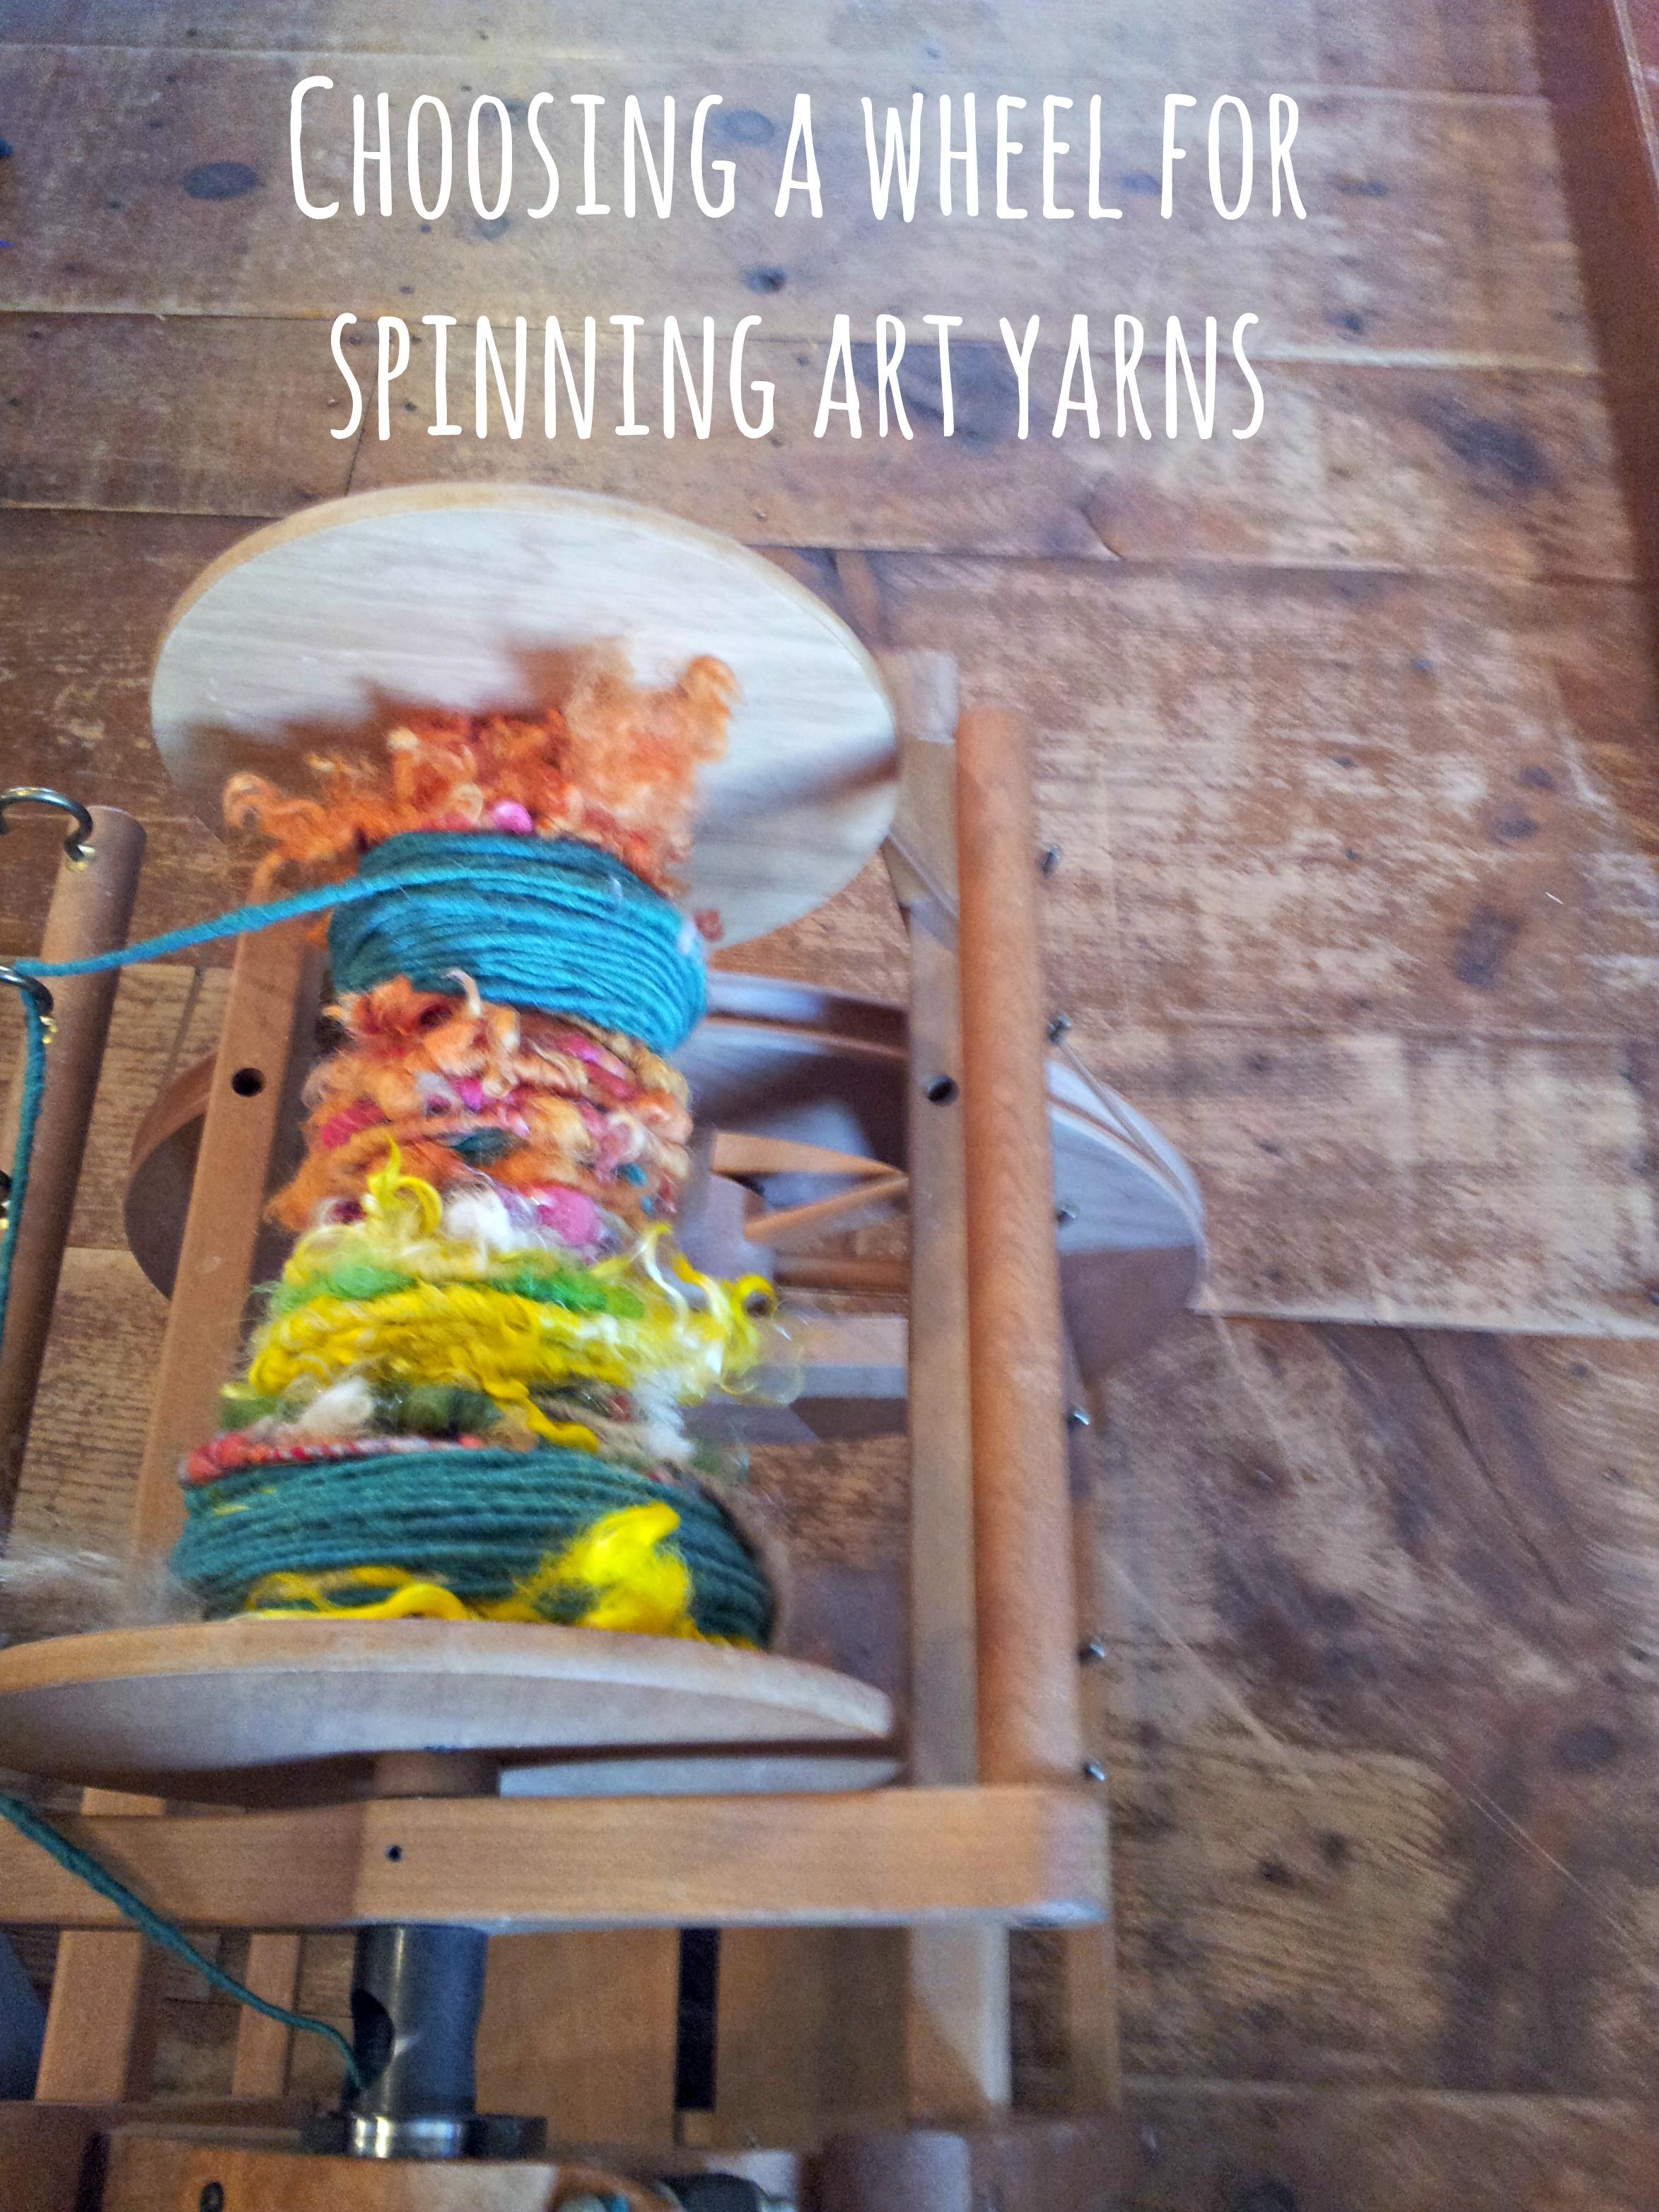 Title Image: Choosing a Wheel for Spinning Art Yarn